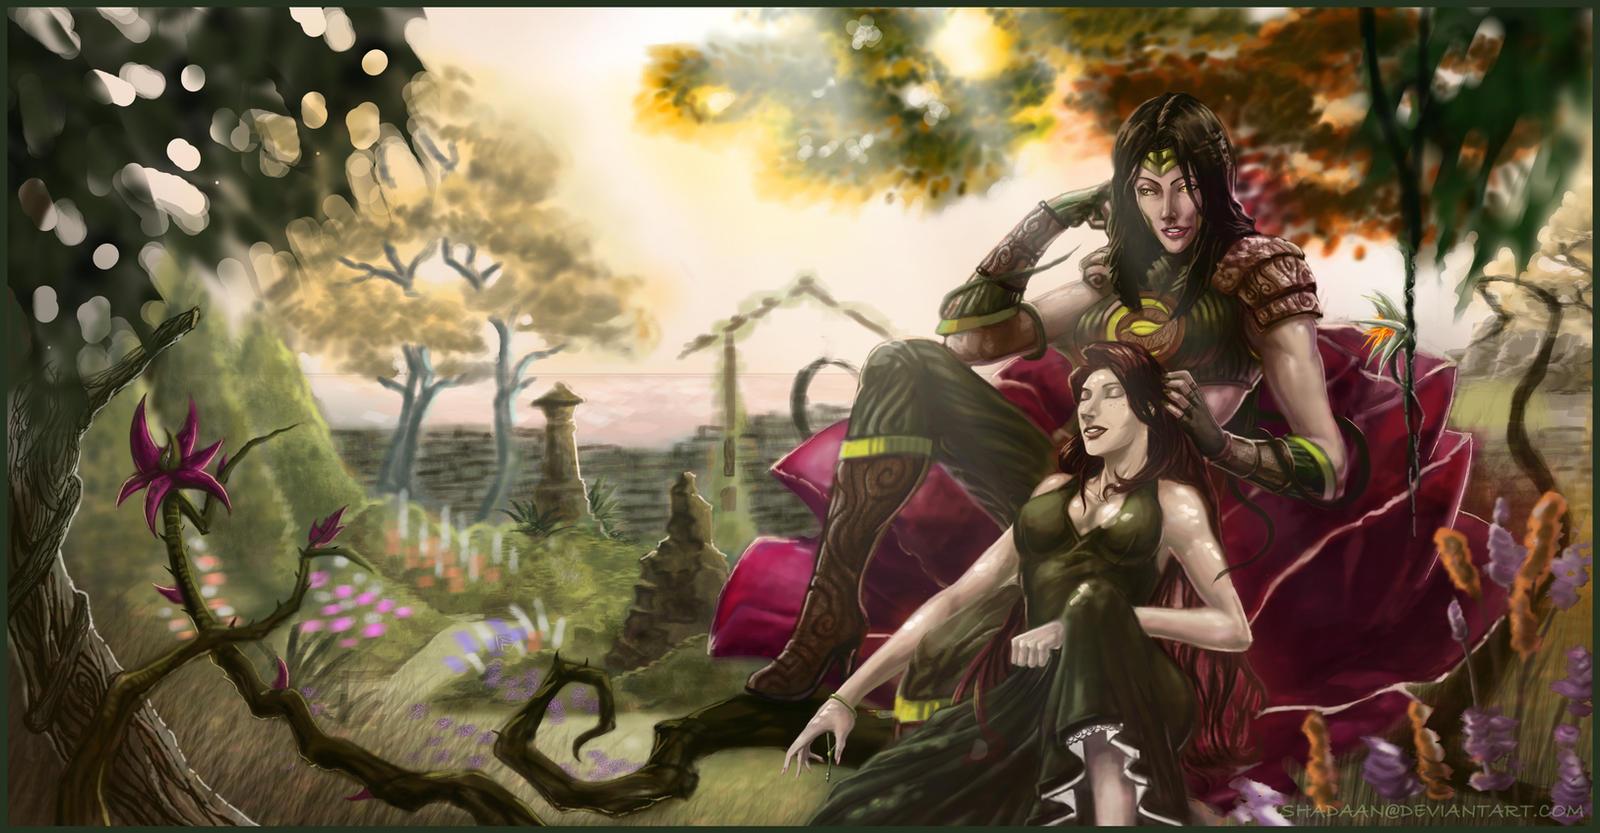 Empress: Living Garden by Shadaan